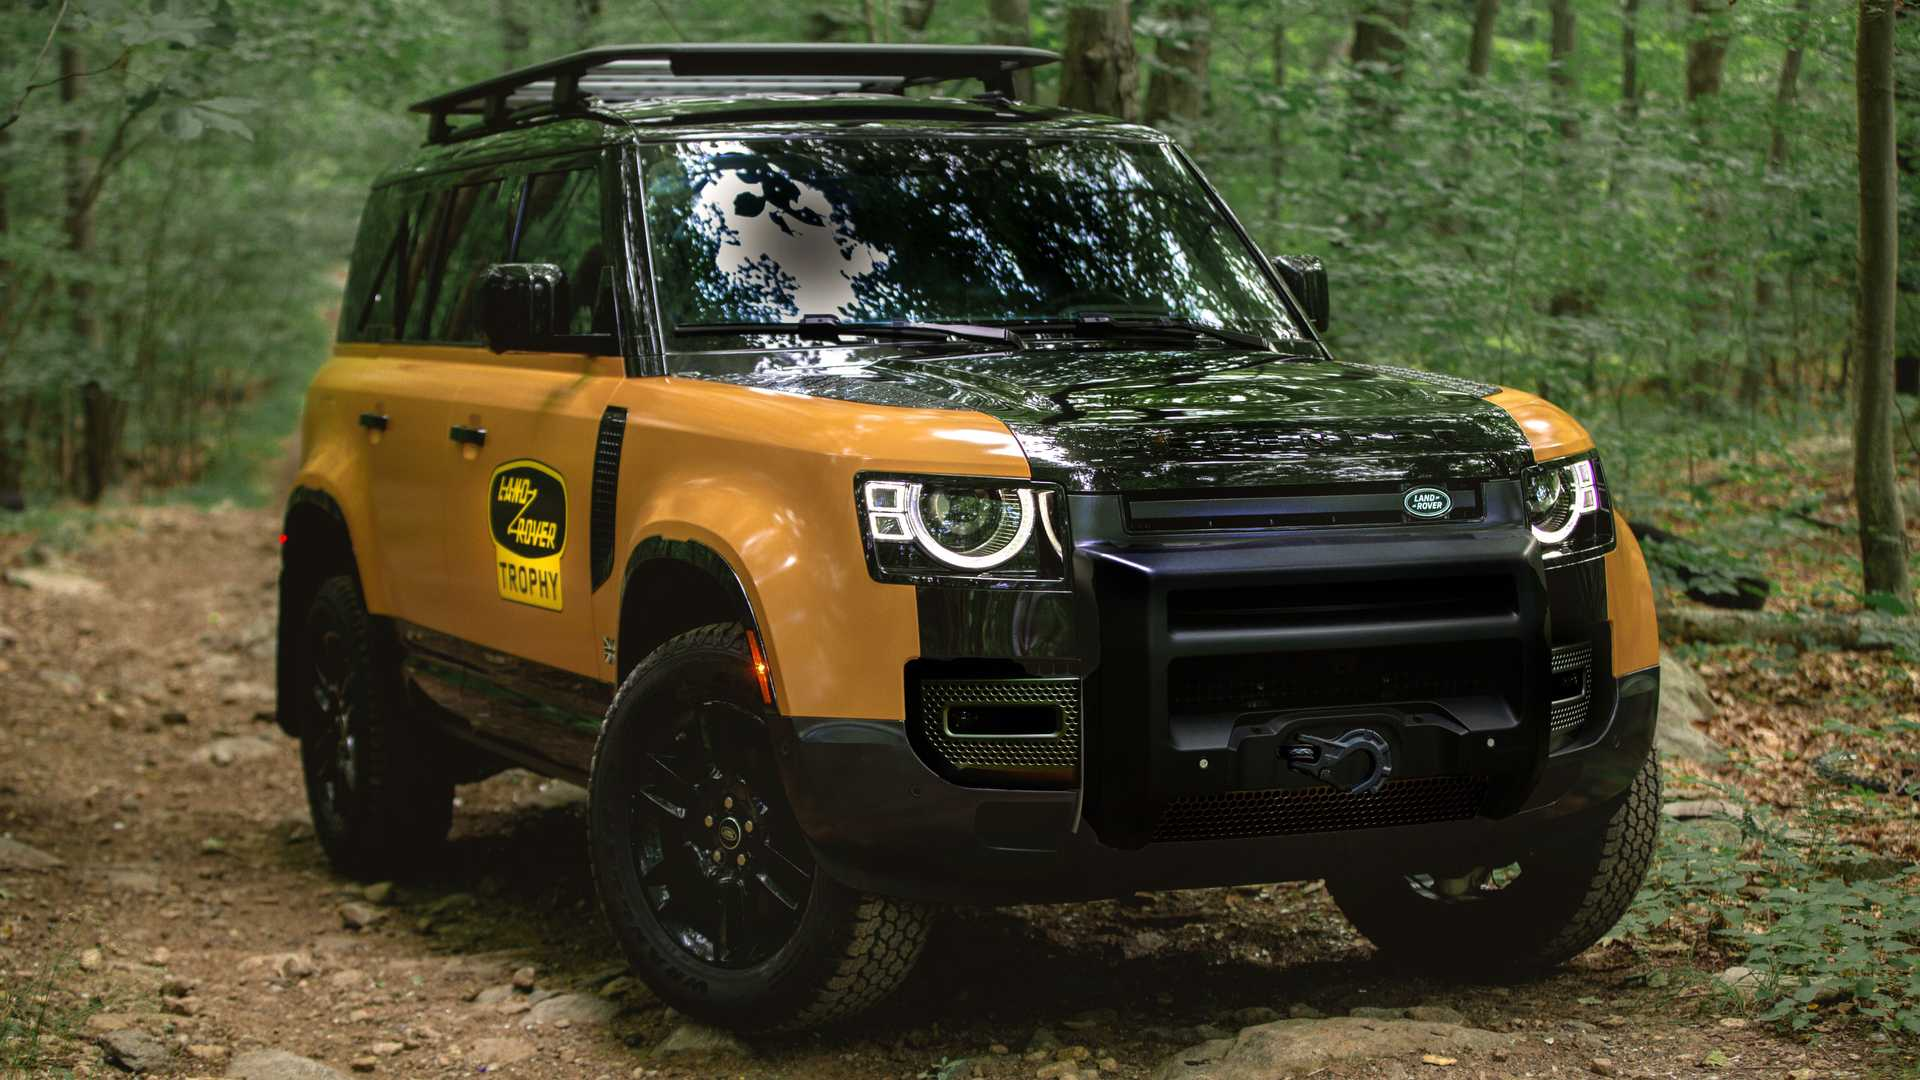 Land-Rover-Defender-Trophy-Edition-4